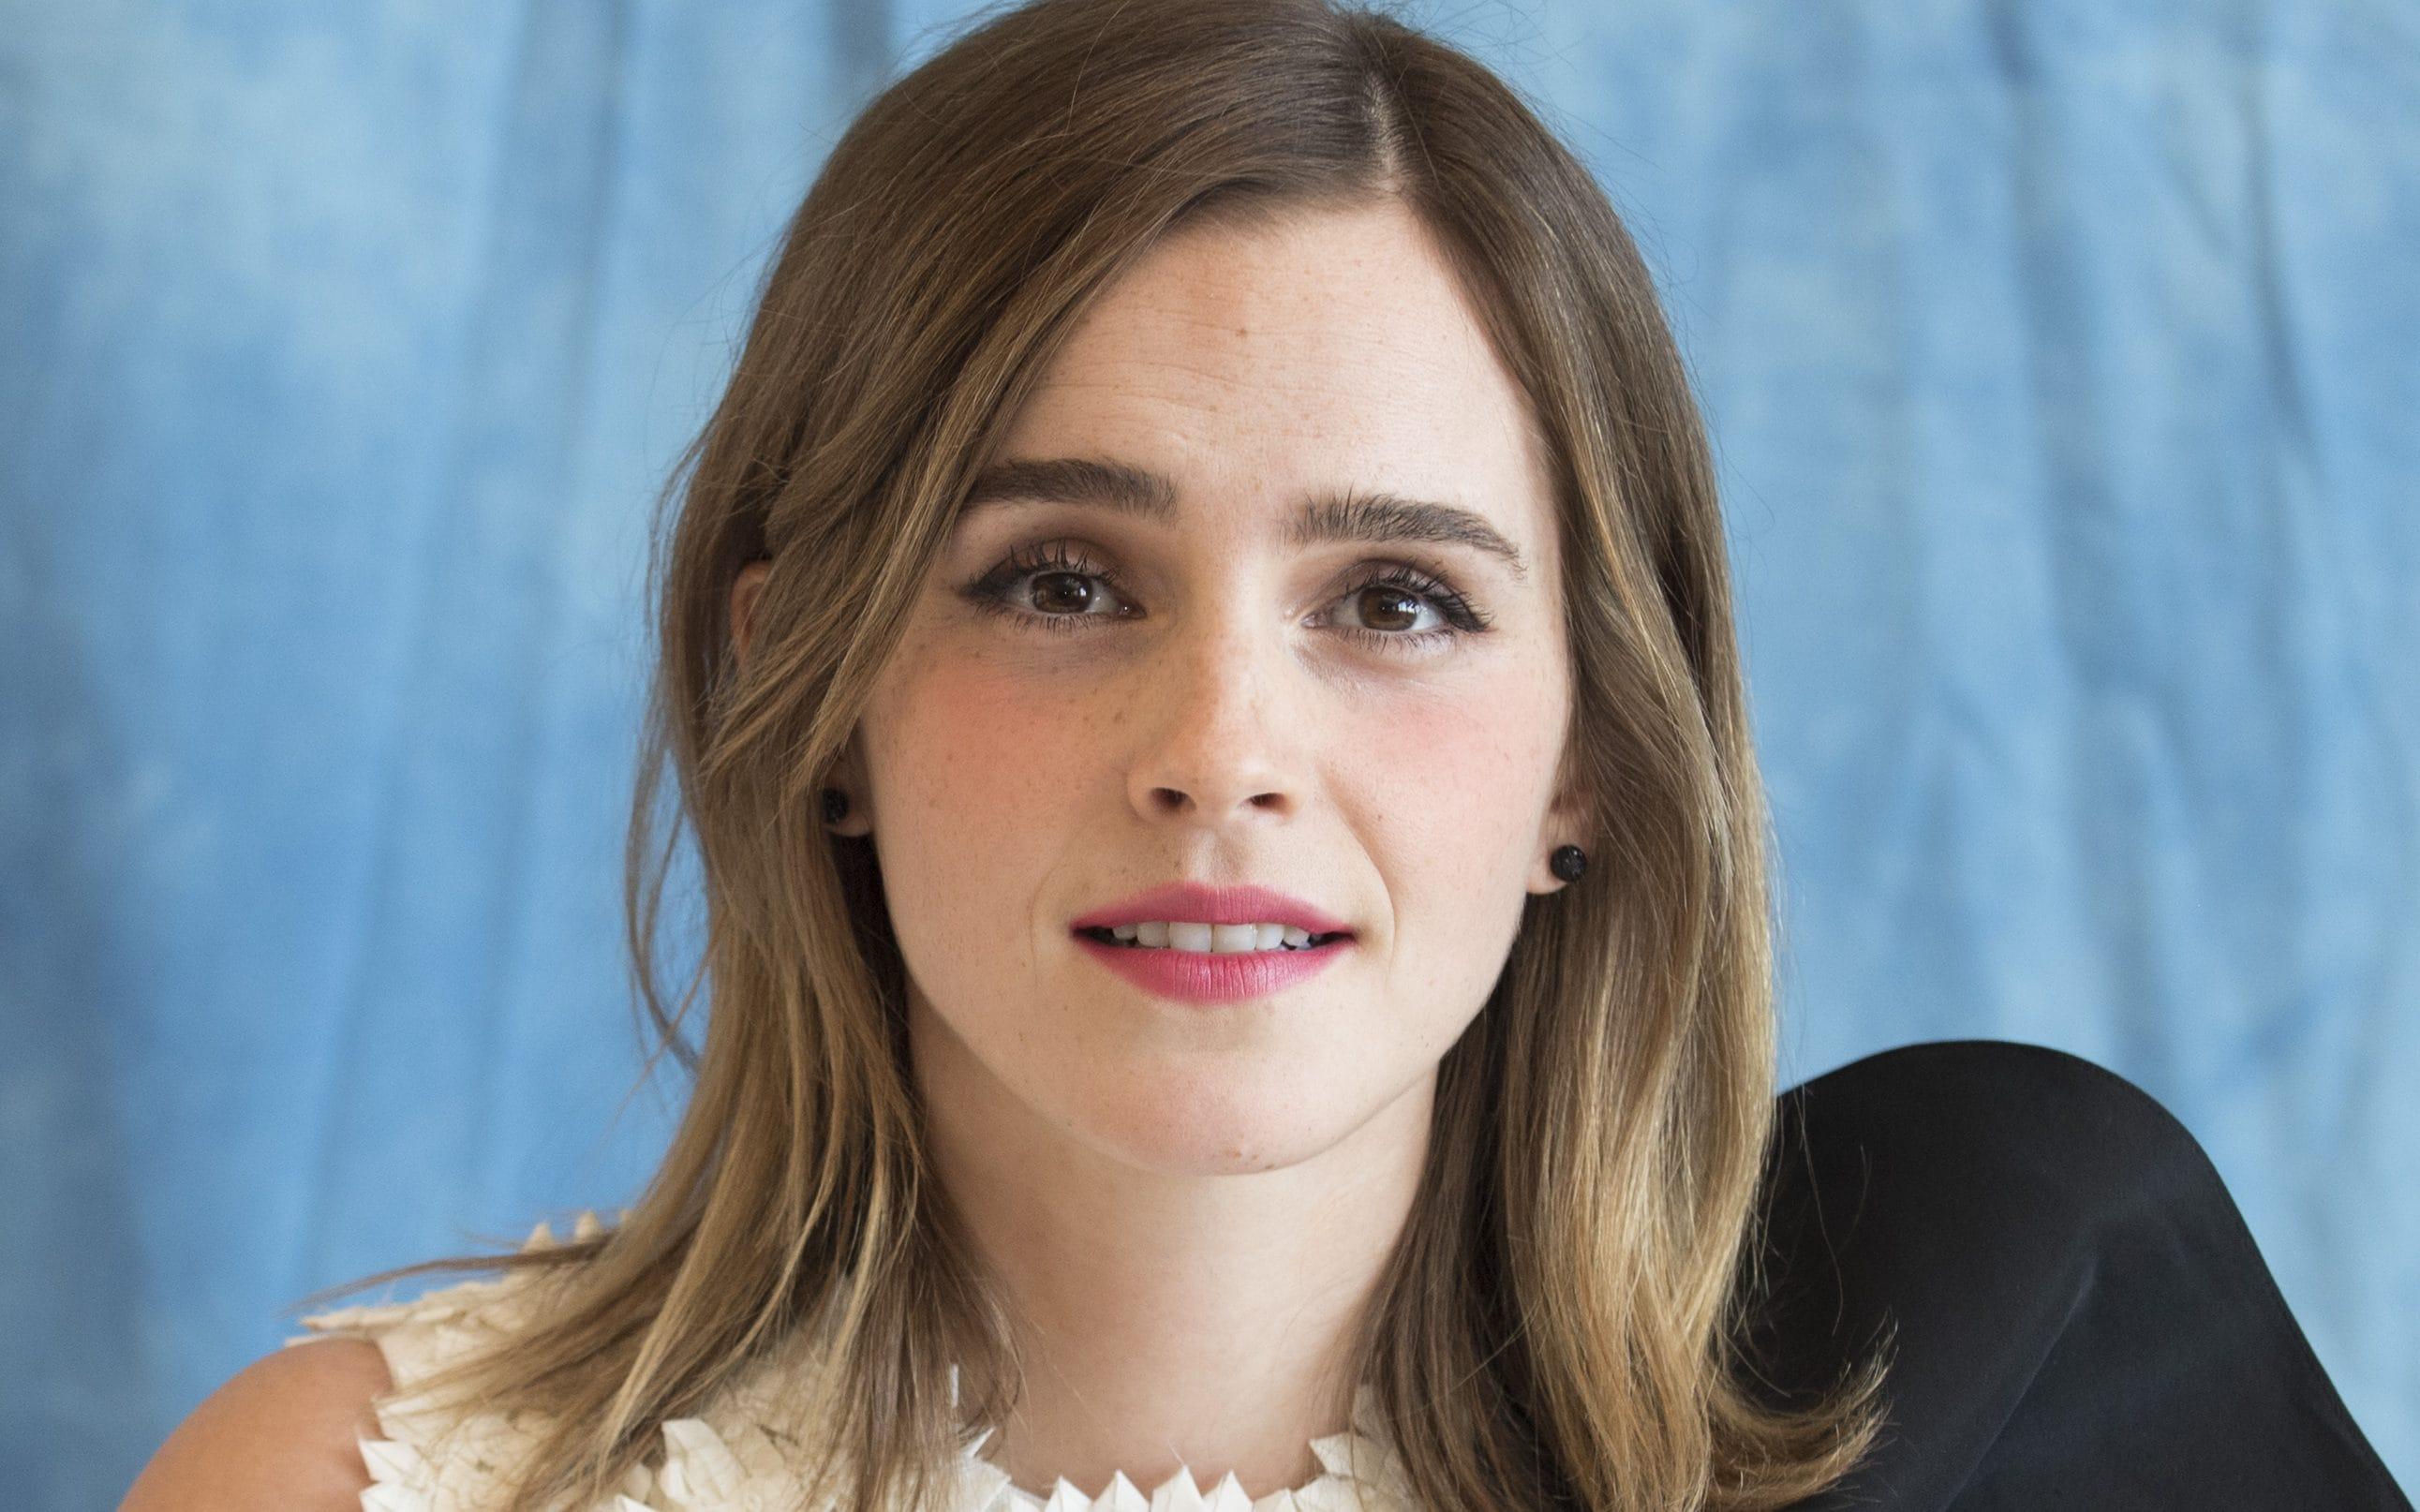 Emma Watson Icloud Leak photo 6